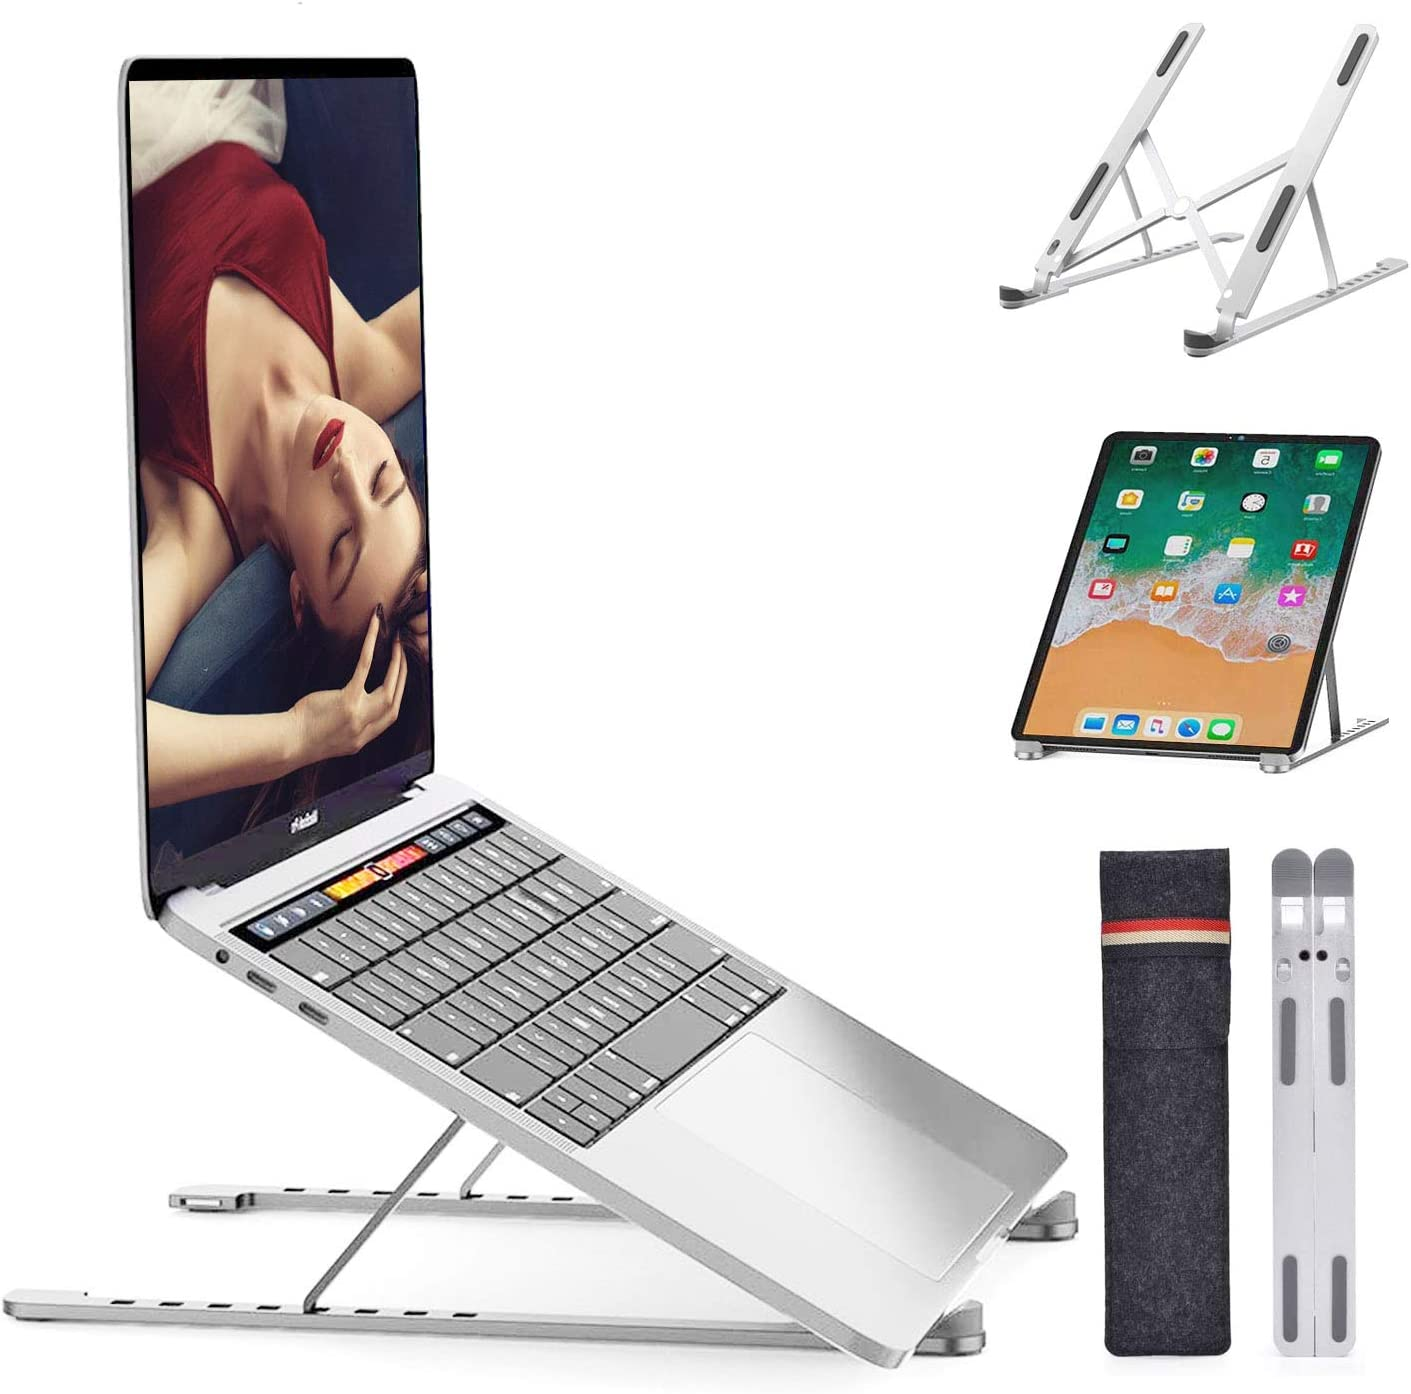 "Laptop Stand Adjustable Computer Stand,Portable Laptop Riser for Desk,Foldable Laptop Stands,8 Angles Adjustable Laptop Holder,Macbook Stand,laptop mount for MacBook Pro Air/Tablet/iPad/8-17.3""Laptops"